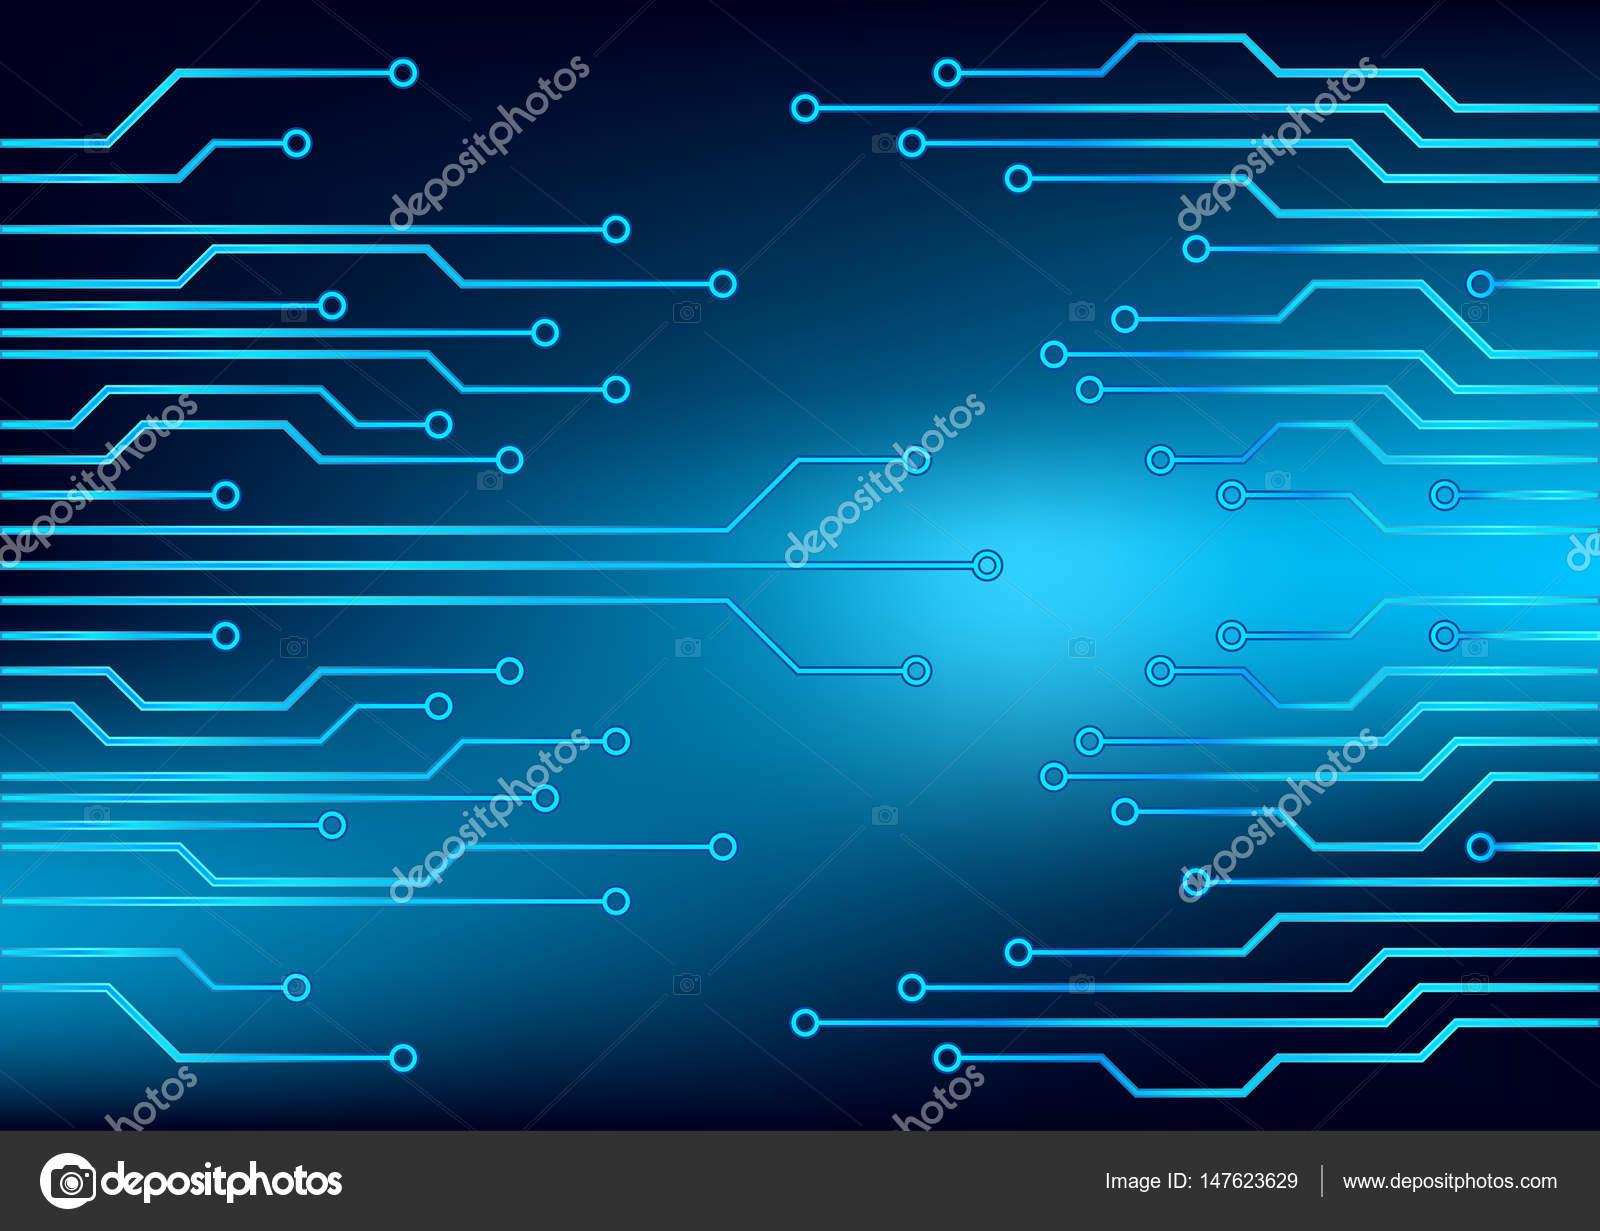 Circuito Eletrico : Circuito elétrico de imagem u stock photo trishkin r